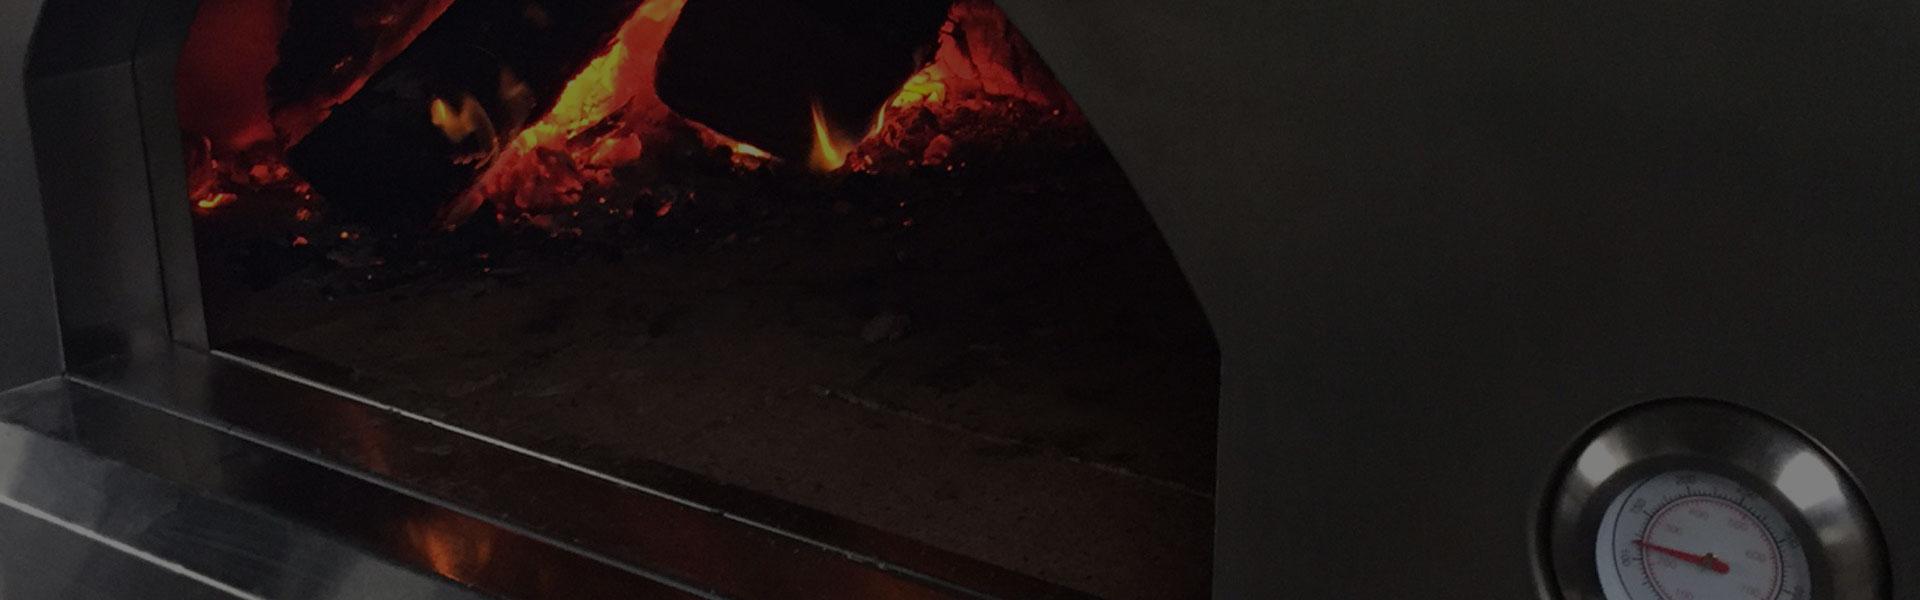 Sapore Wood Ovens Sapore Resources